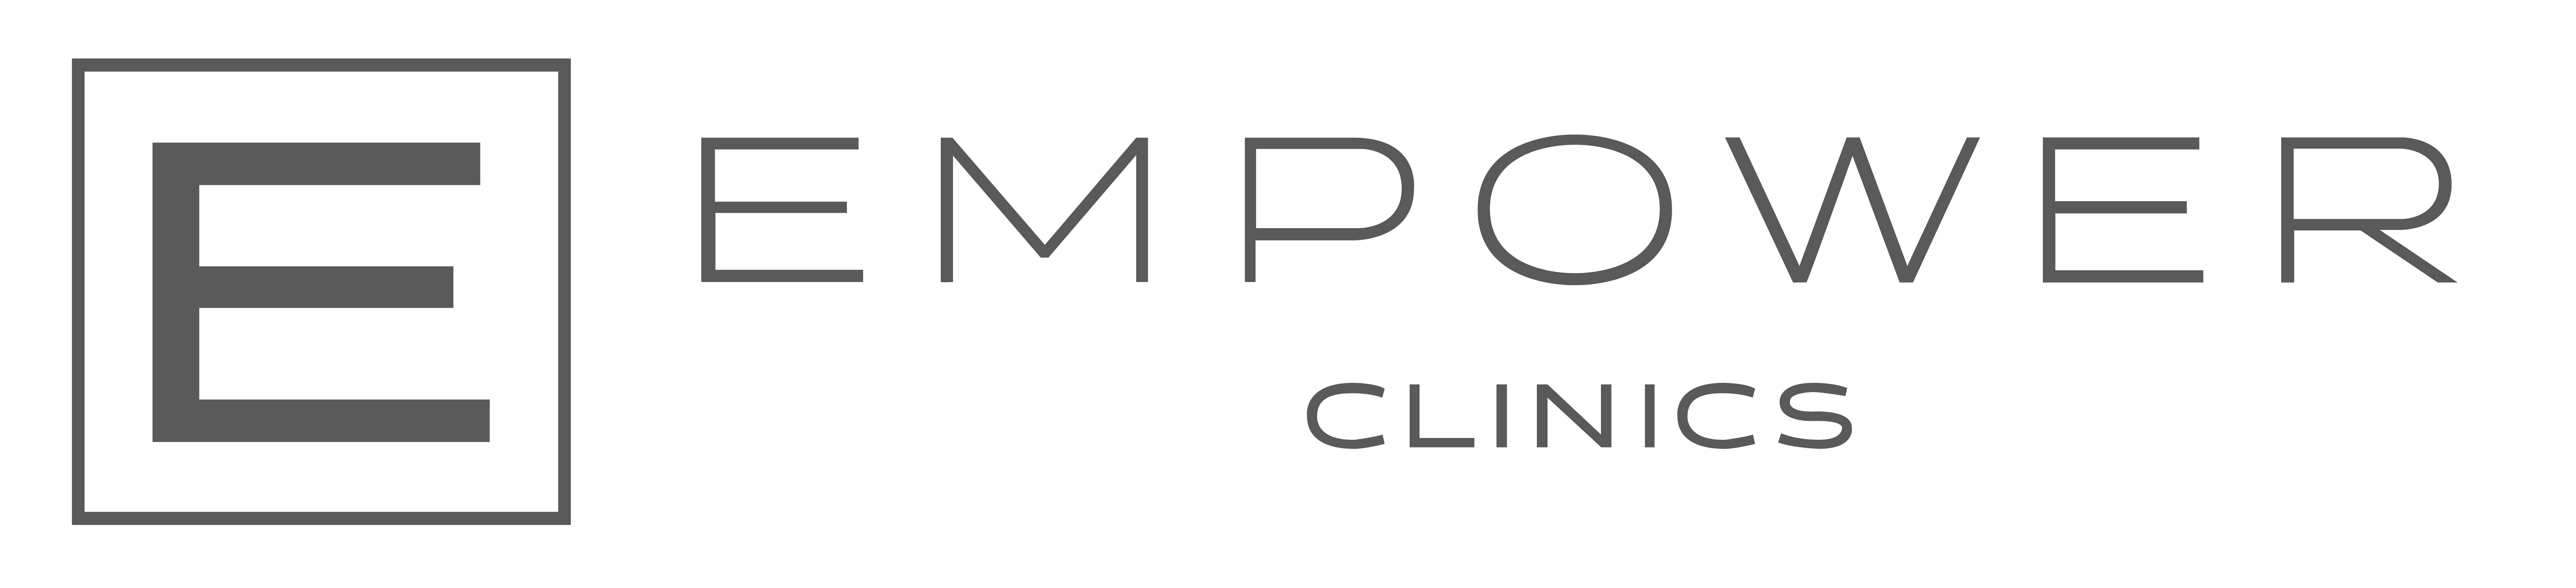 Empower Clinics Inc.